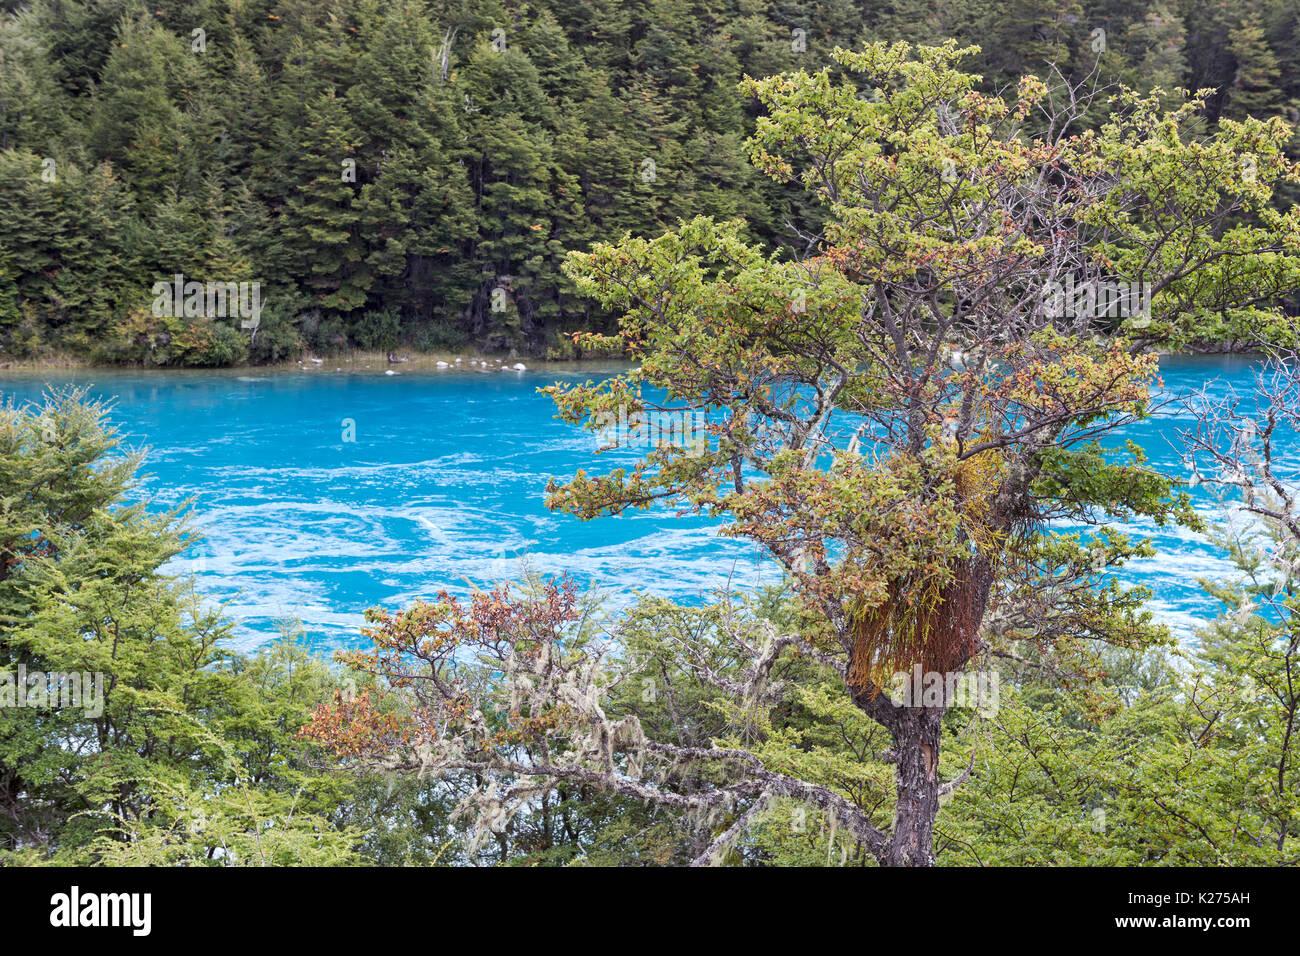 Rio Baker near Puerto Bertrand Carretera Austral 7 Patagonia Park Chile - Stock Image